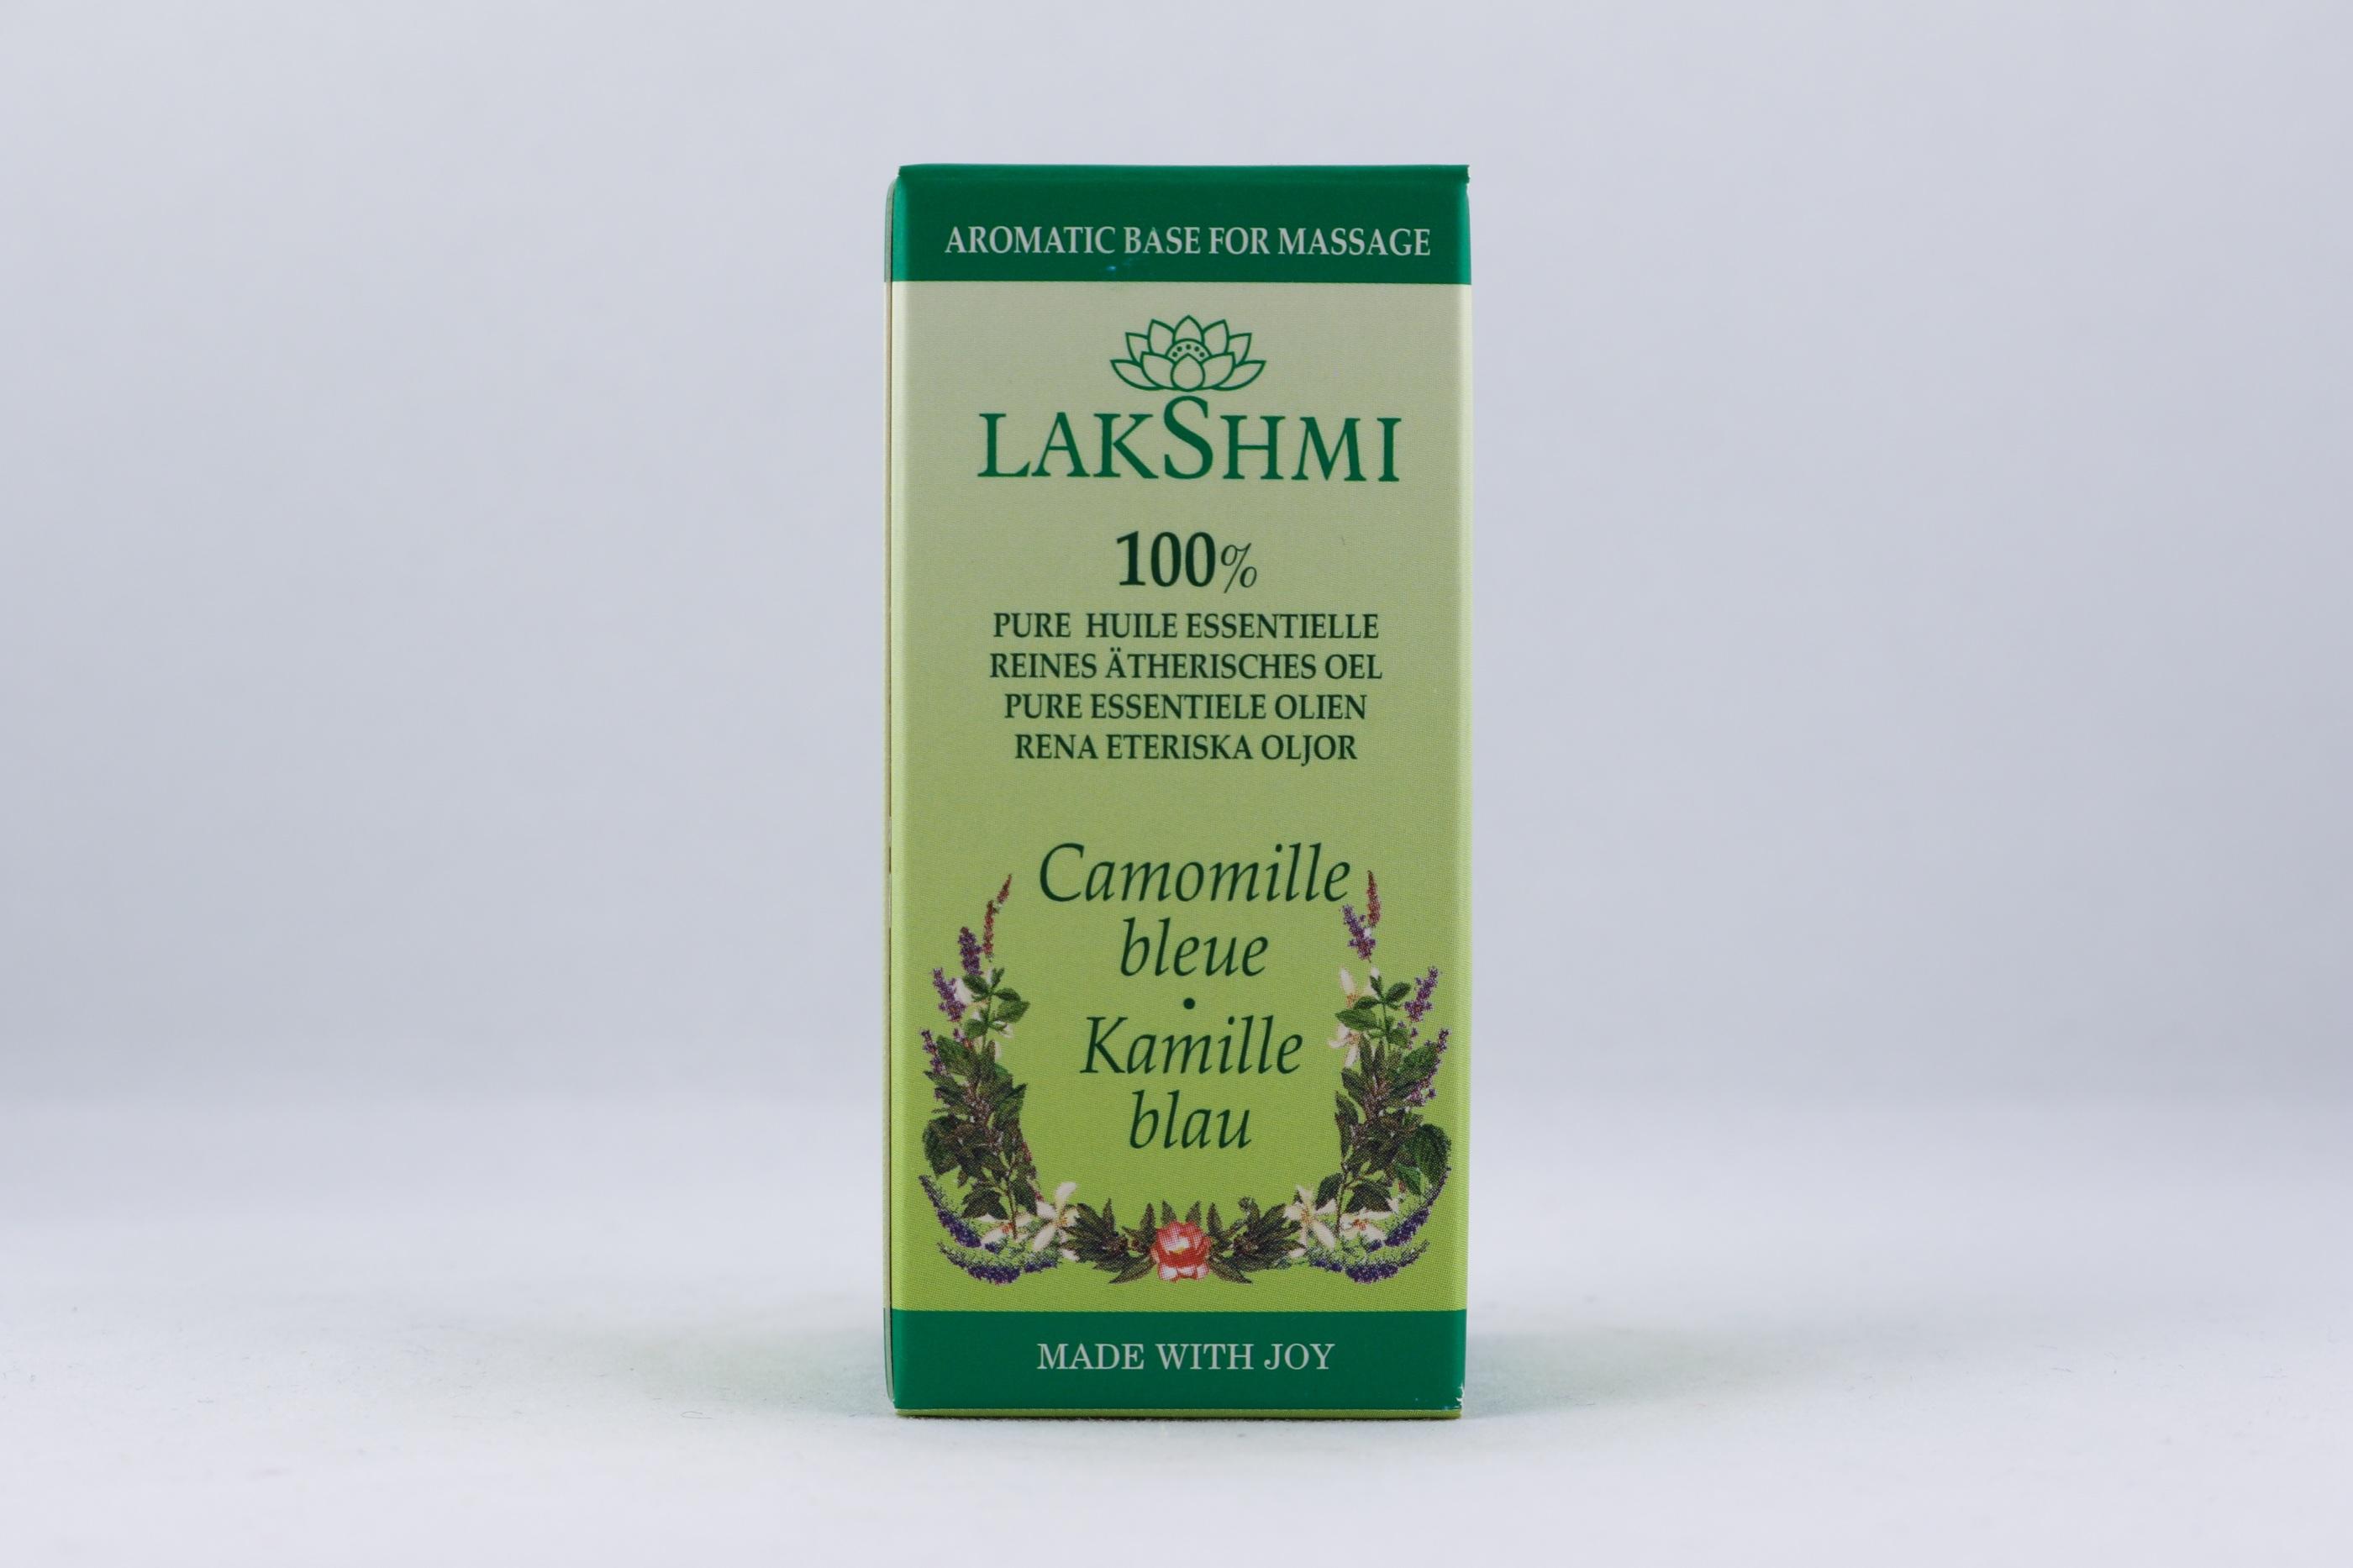 Blå Kamomill wellness ayurveda halmstad sweden svensk eterisk aroma olja